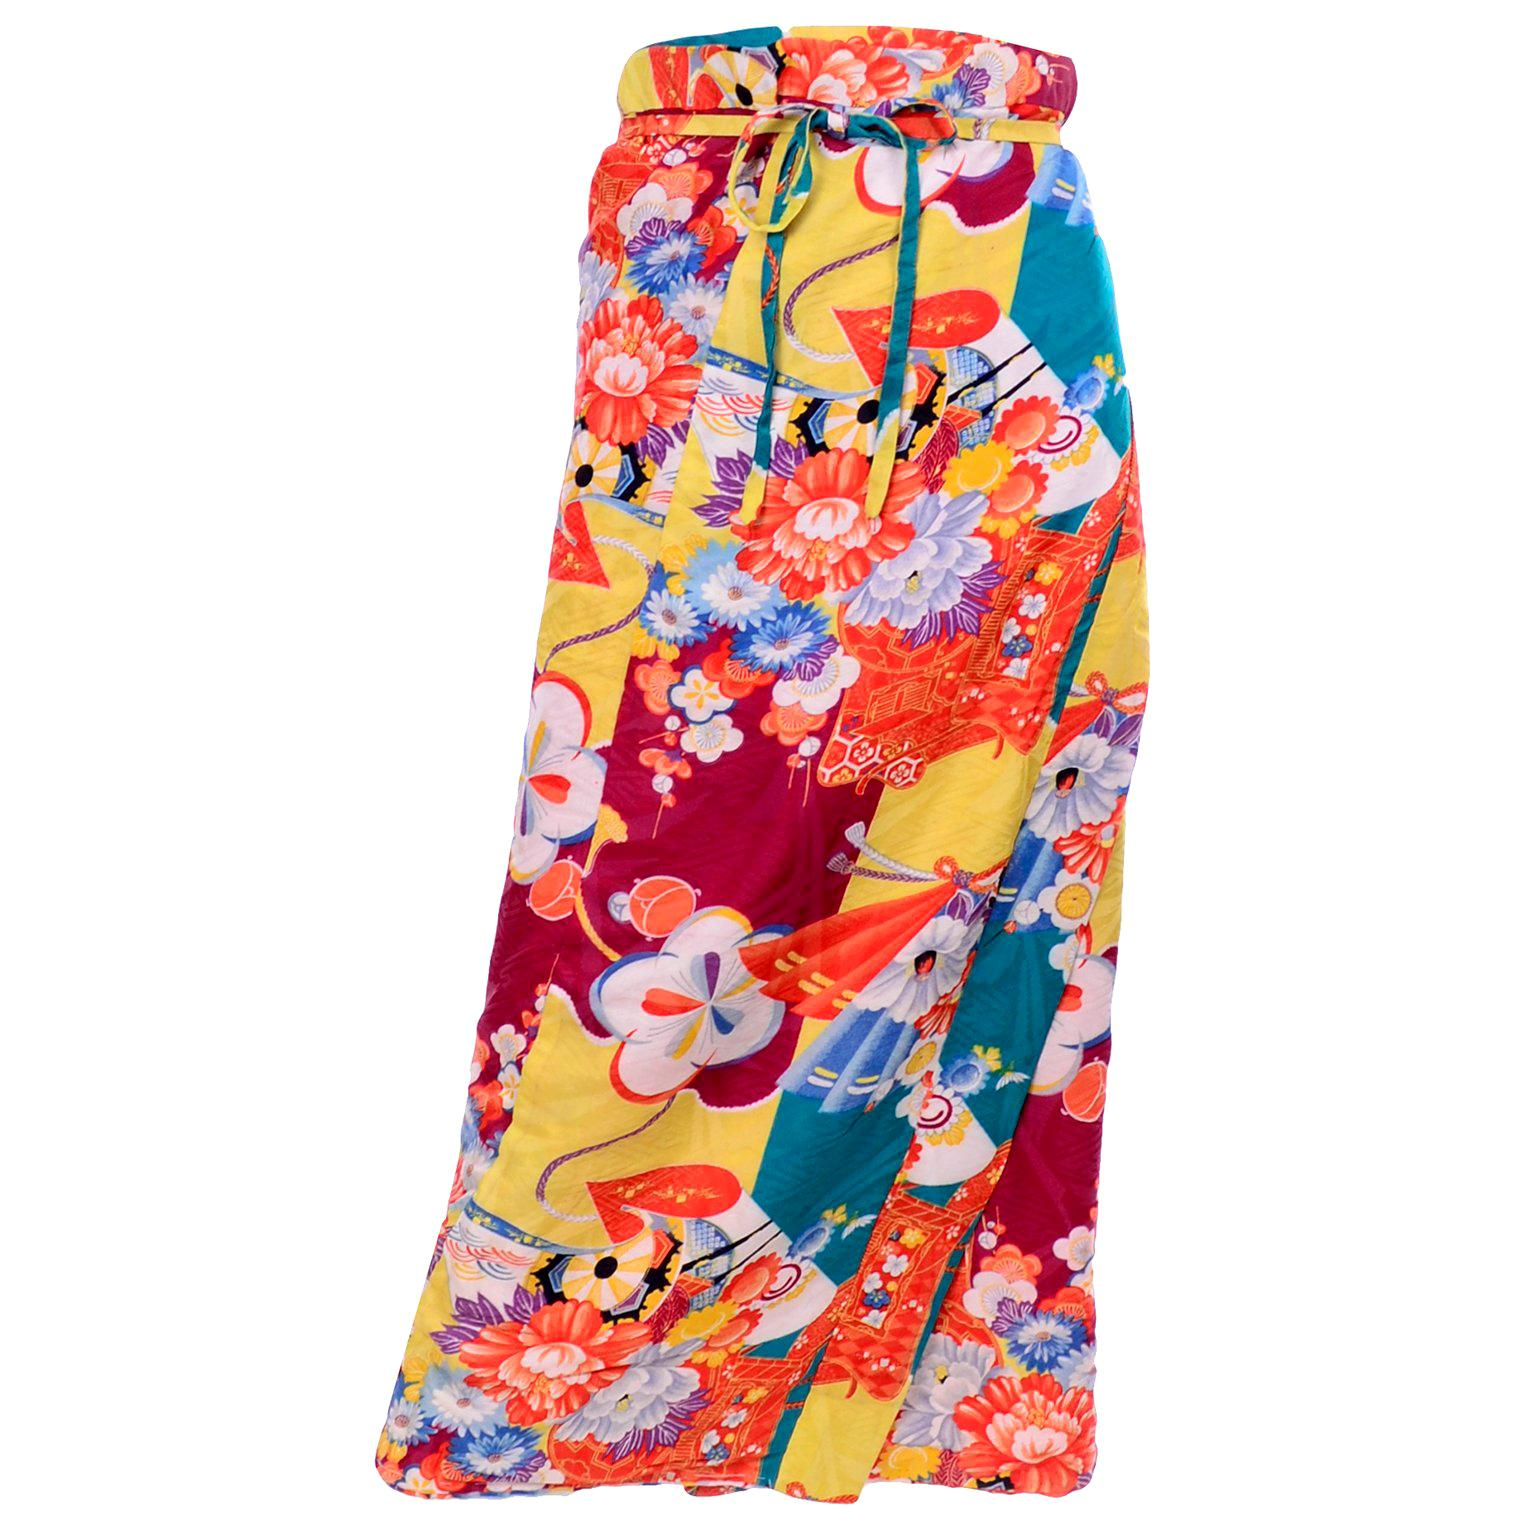 1930s Silk Japanese Susoyoke Skirt in Orange Red Yellow & Blue Damask Print